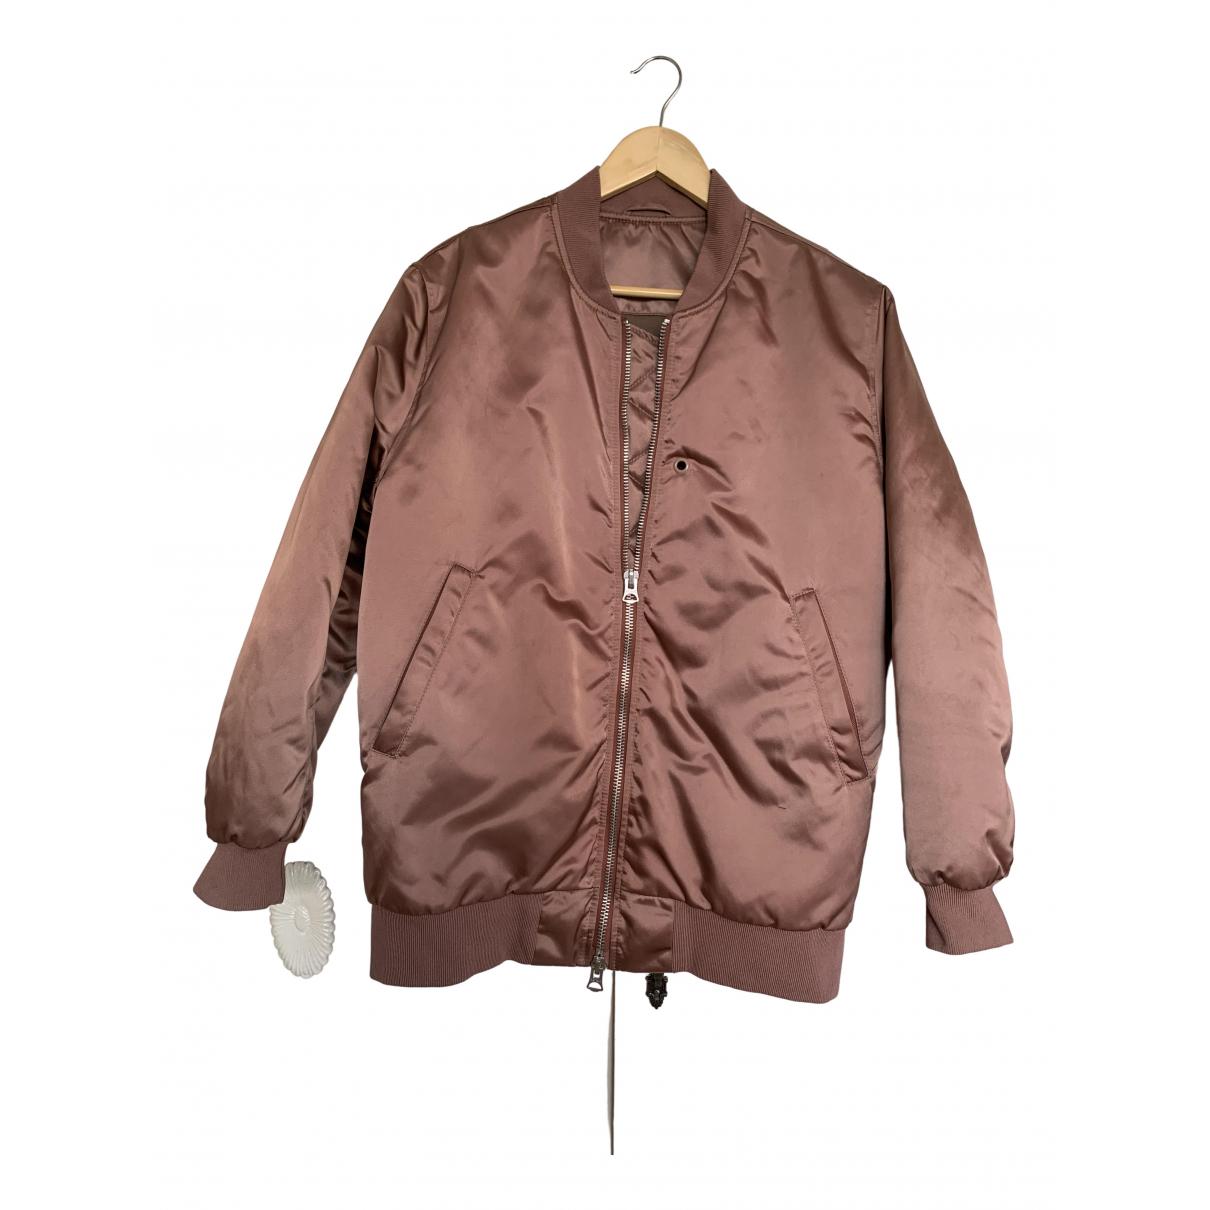 Acne Studios \N Pink jacket for Women 34 FR